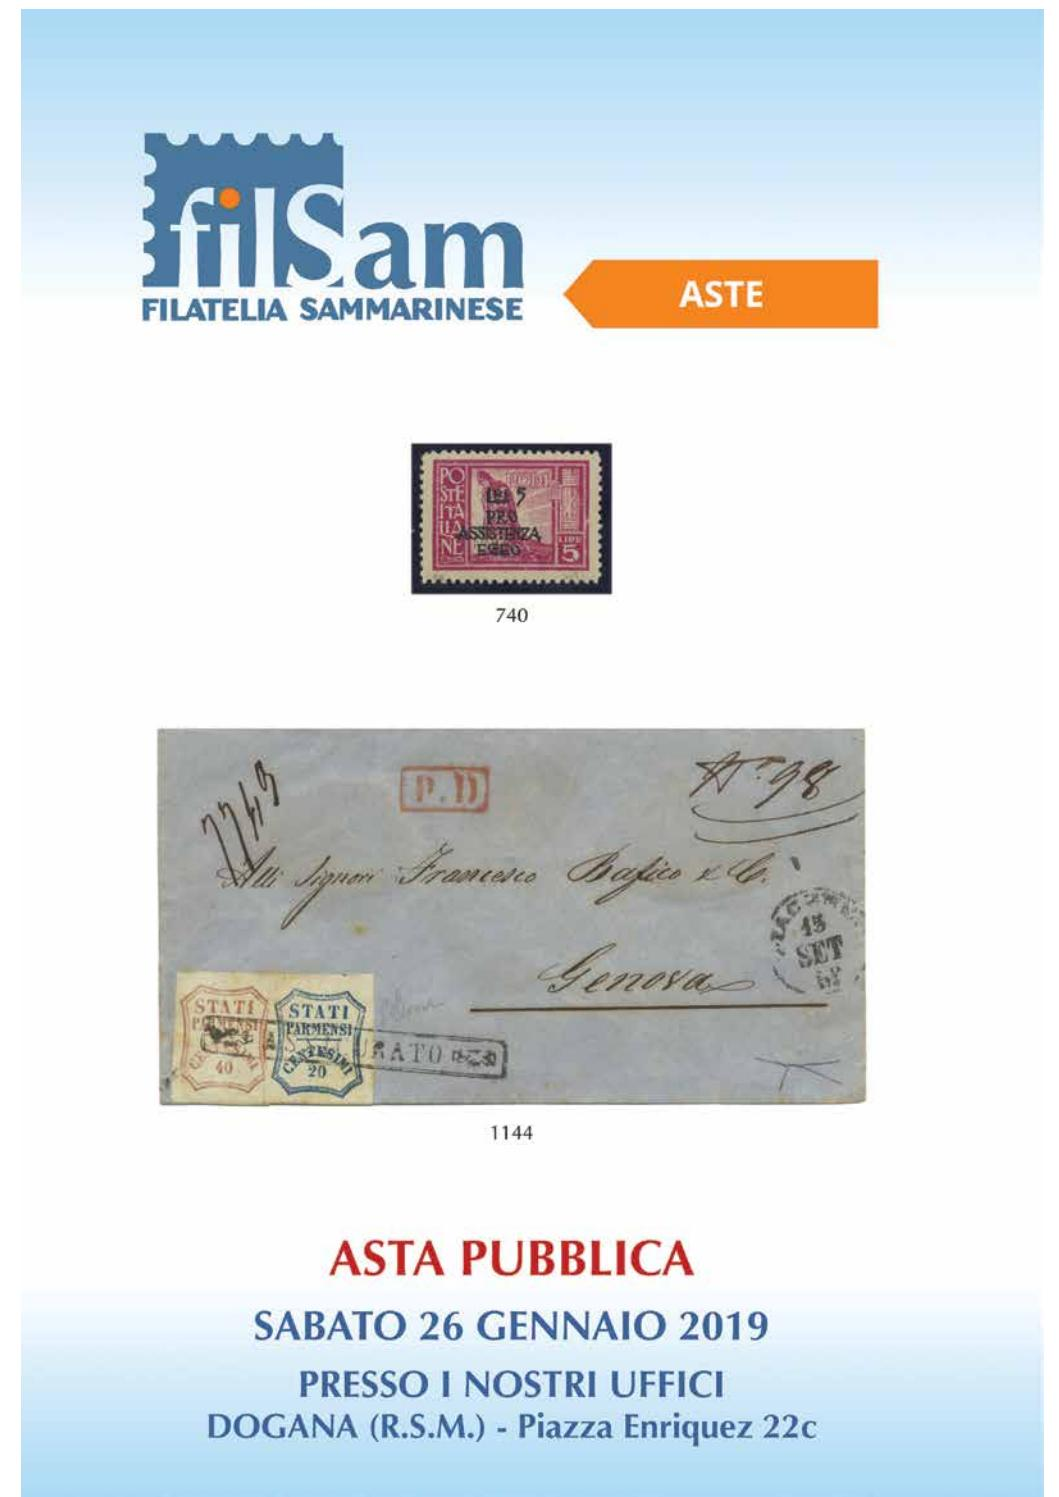 ASTA PUBBLICA 26 GENNAIO 2019 by Filatelia Sammarinese s.r.l.   issuu